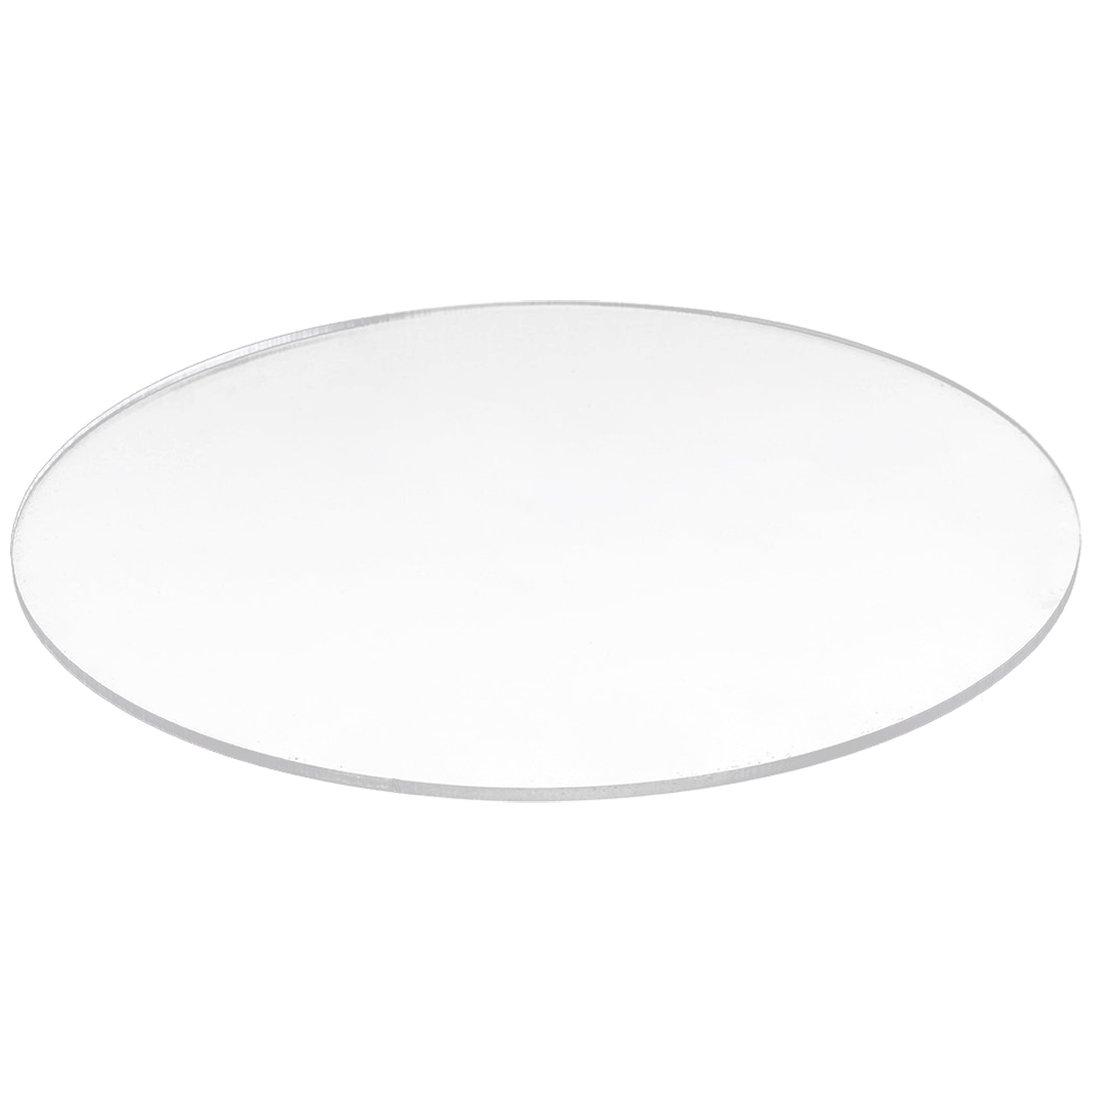 Acrylic round Disc - TOOGOO(R)Transparent 3mm thick Mirror Acrylic round Disc Di¨¢metro:80mm